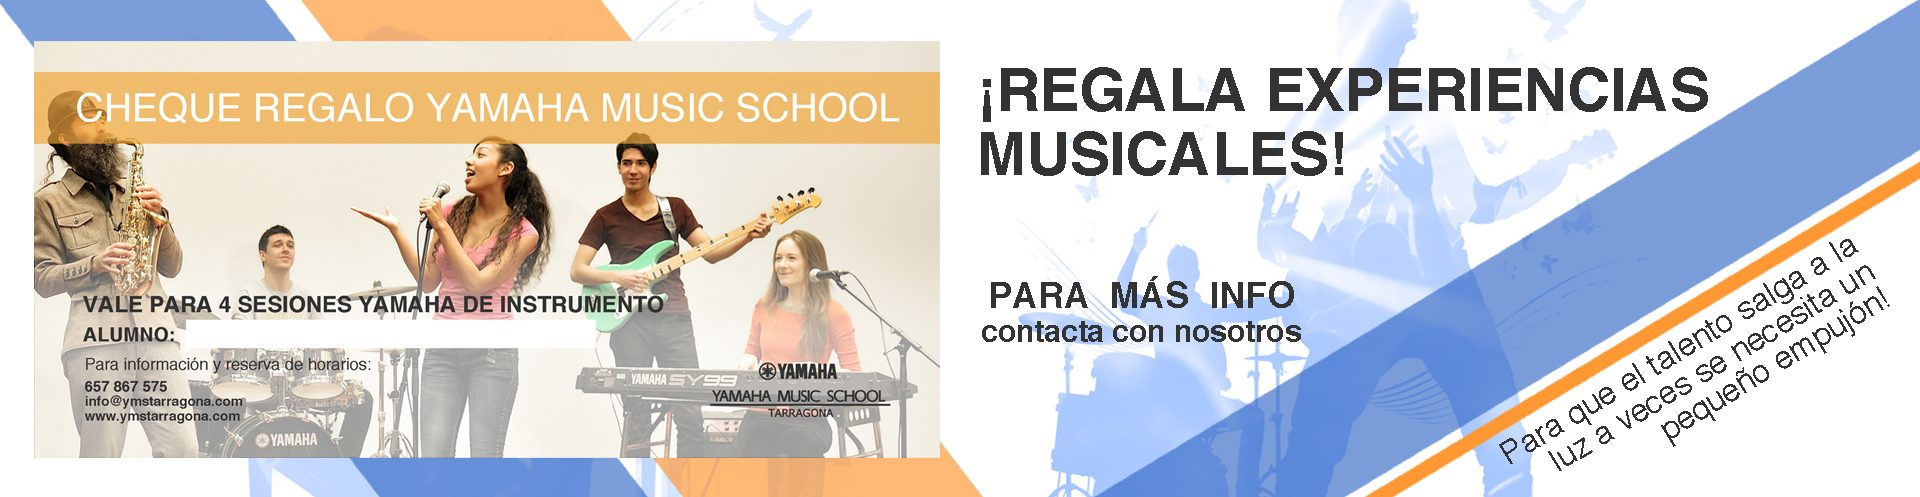 M s instrumentos junior yamaha music school tarragona for Yamaha music school los angeles